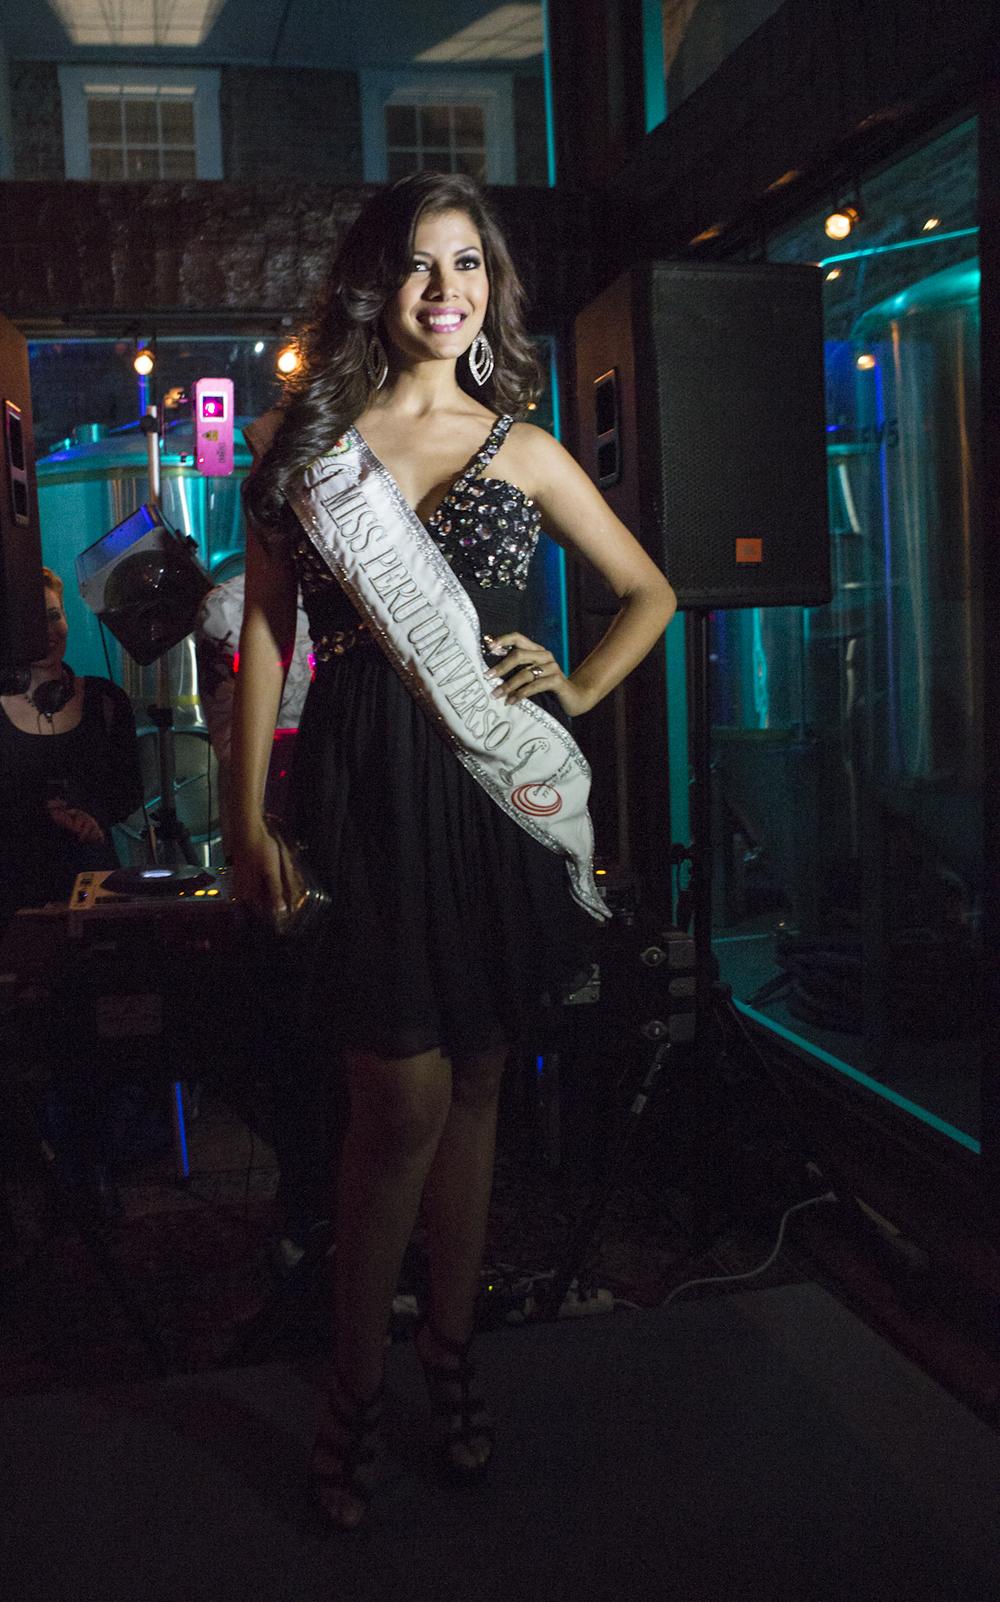 Miss Peru 2014 models during the fashion show at Darwin's Restaurant.  © Karen Arango